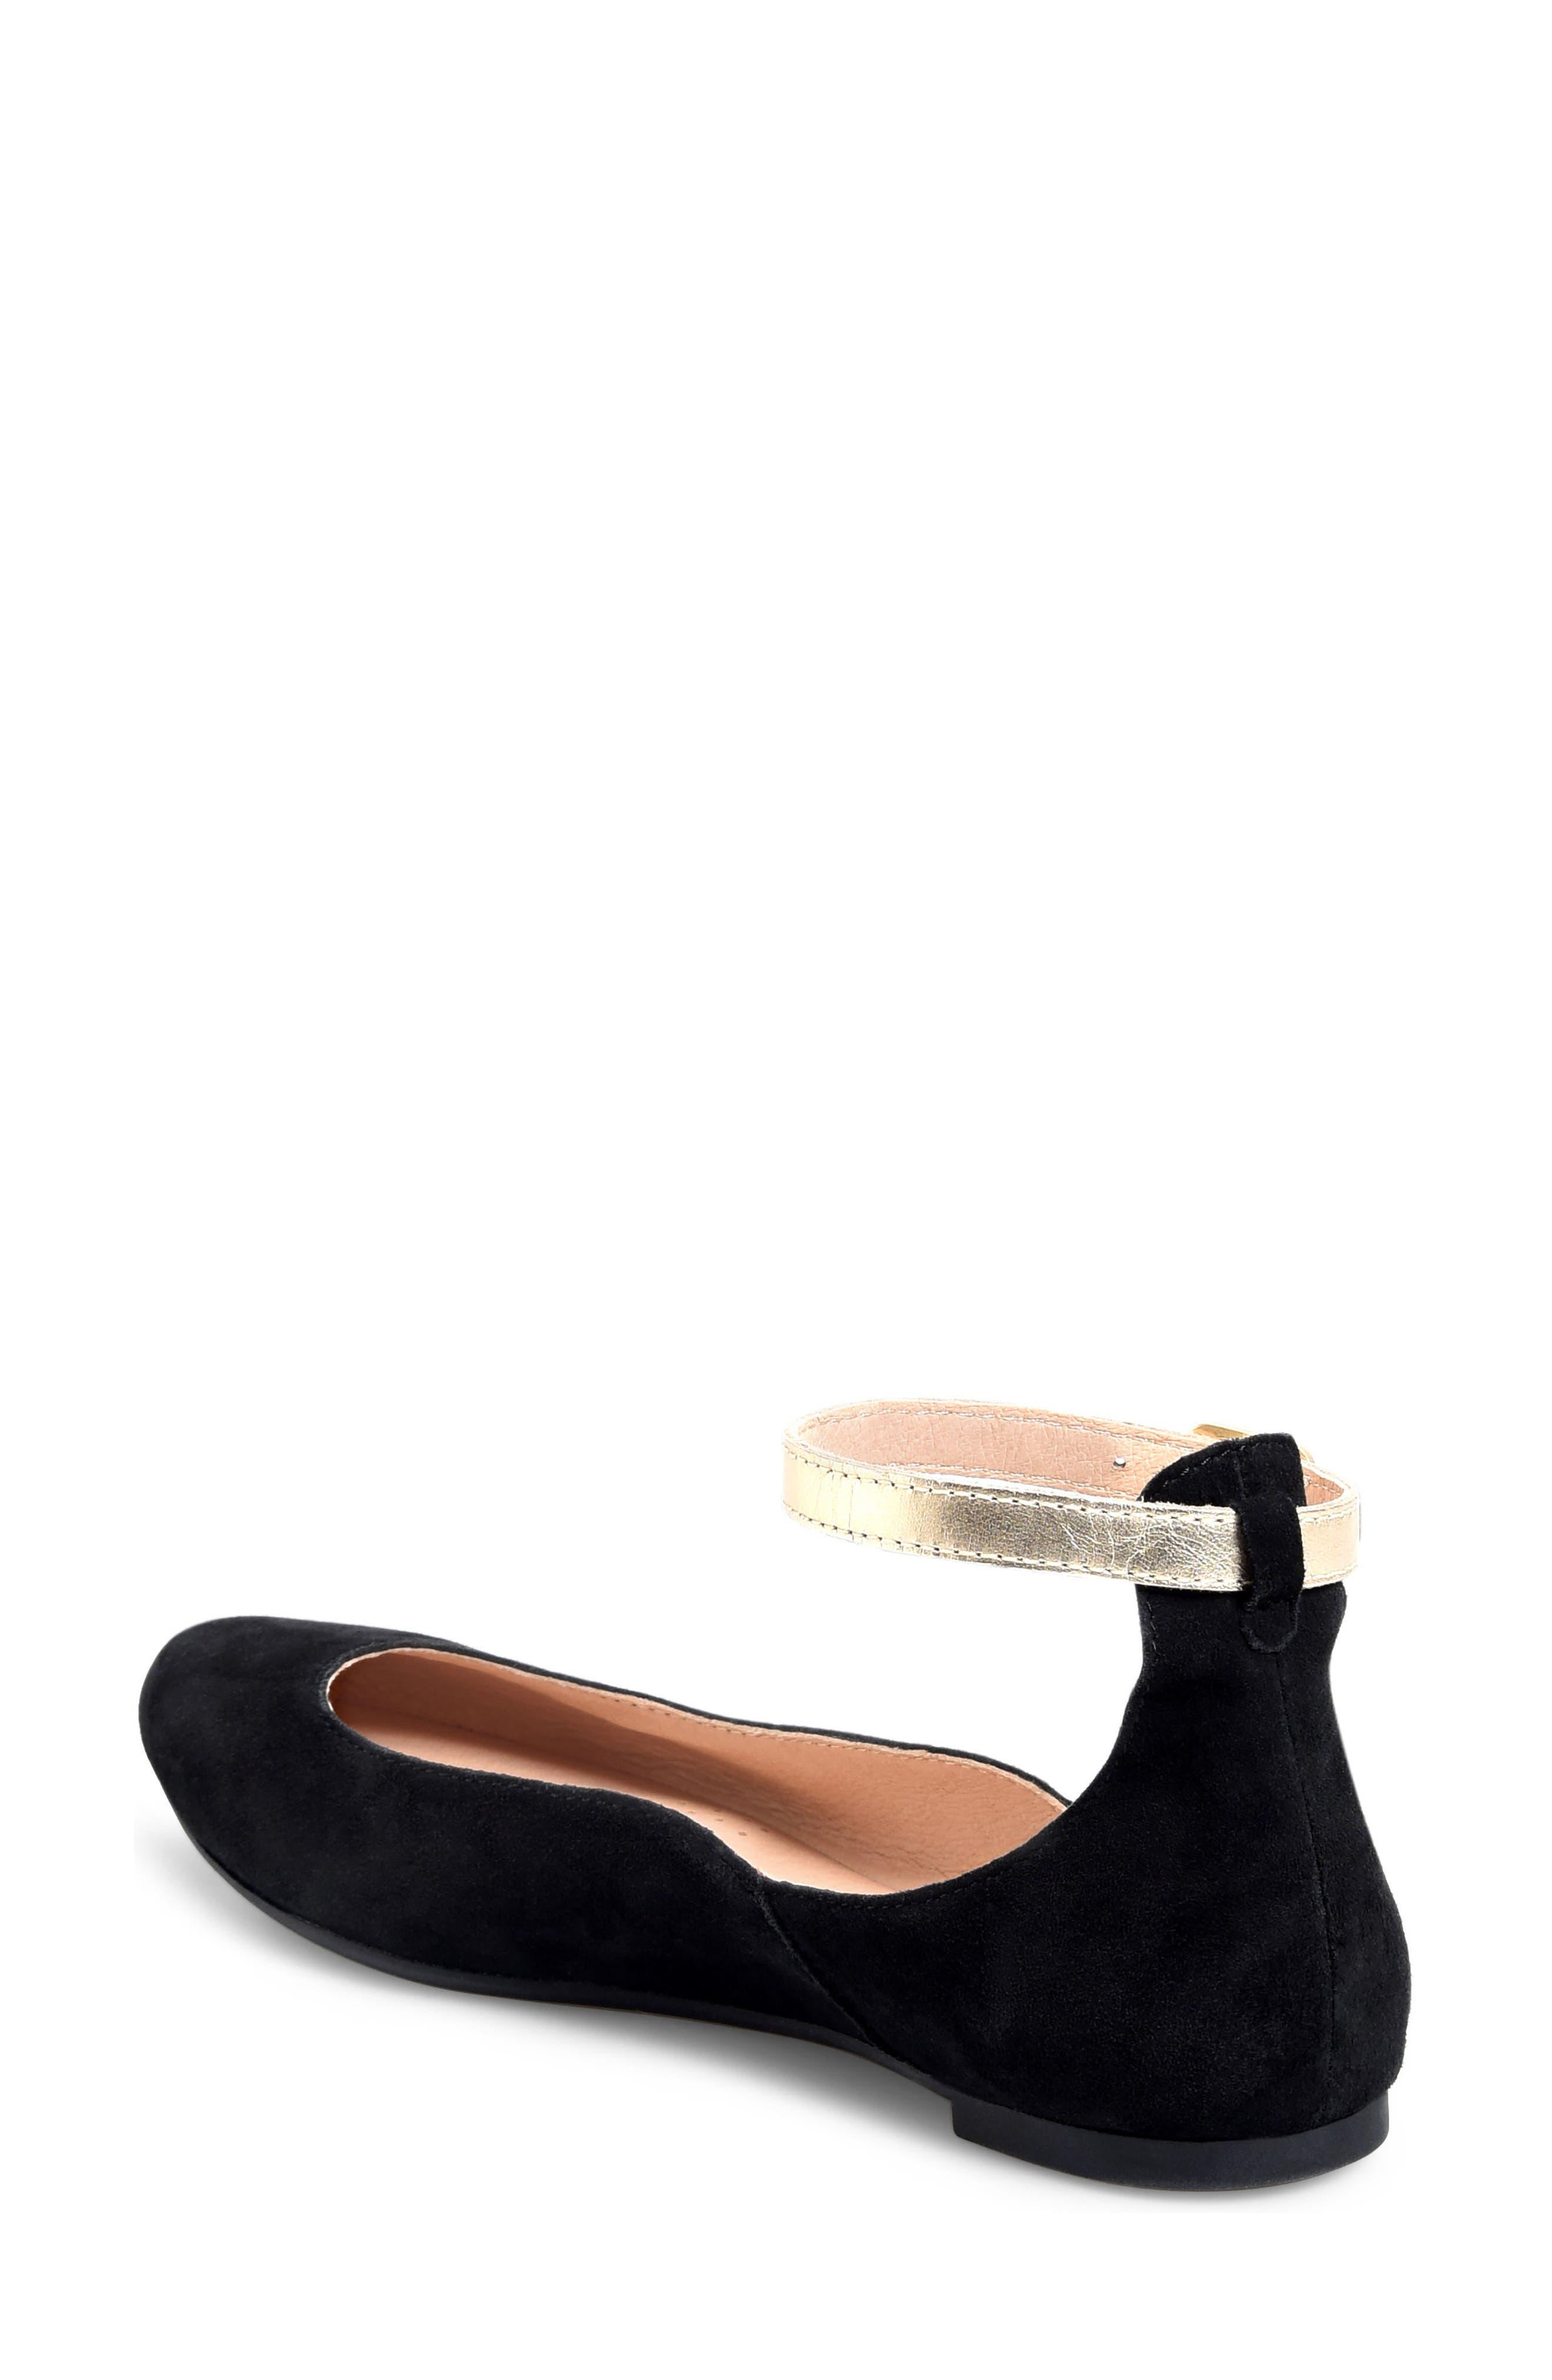 Luchia Ankle Strap Flat,                             Alternate thumbnail 2, color,                             BLACK/ GOLD LEATHER